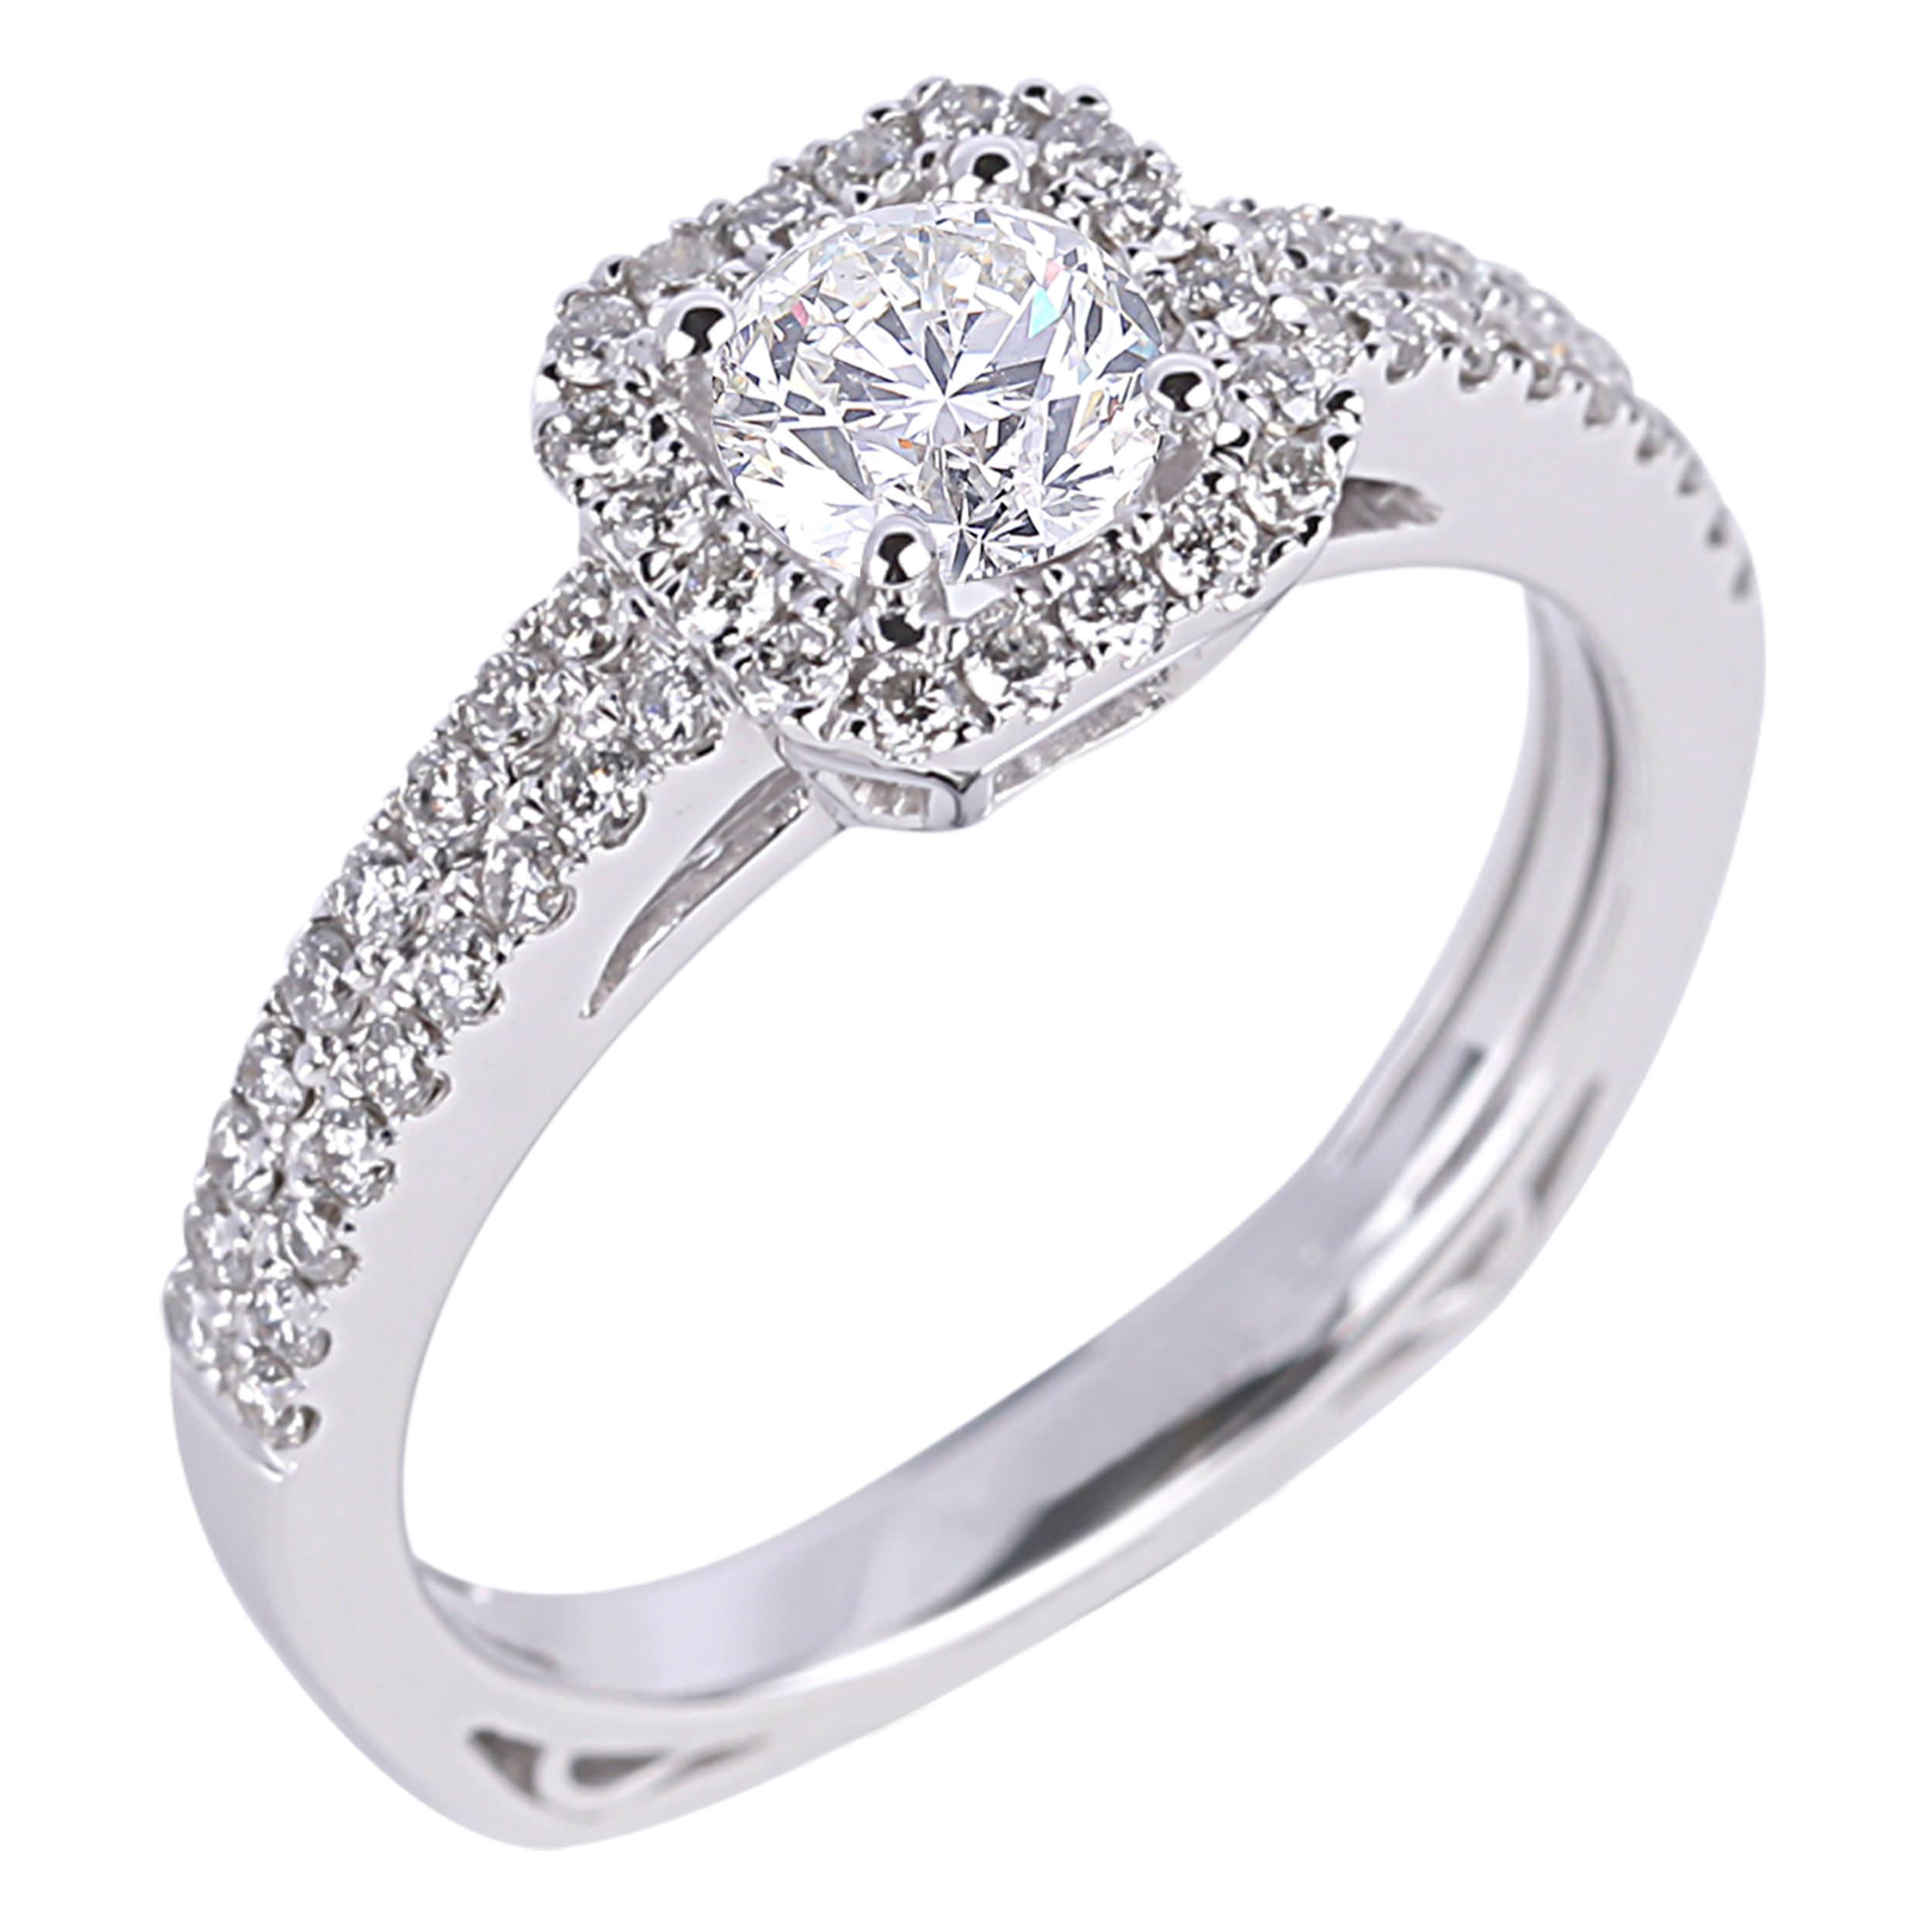 Diamond Engagement Halo Rings SGR939 (Rings)